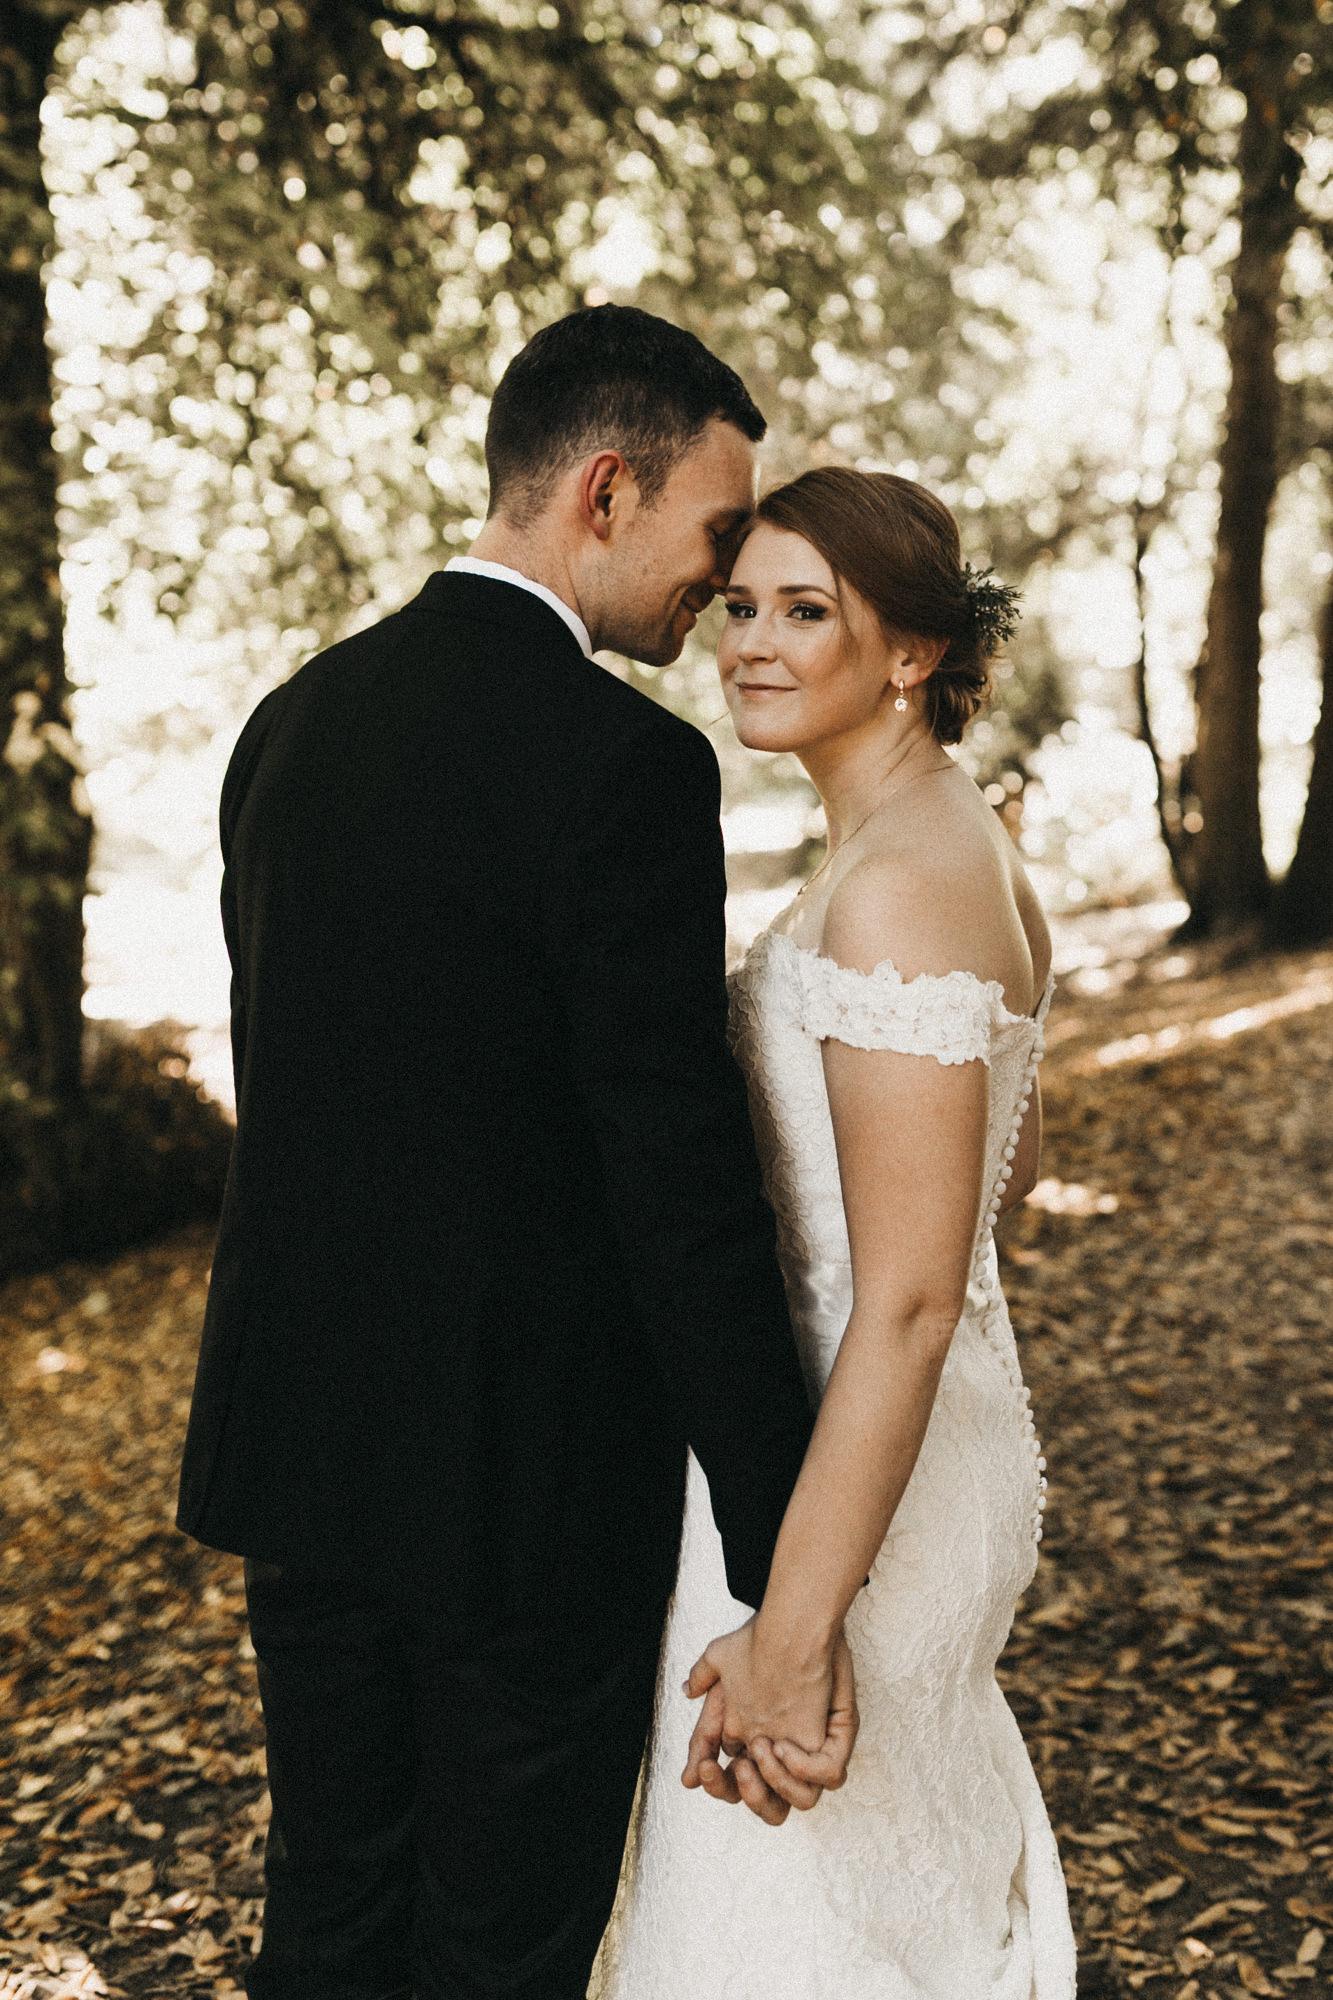 the_evergreen_portland_wedding-24.jpg